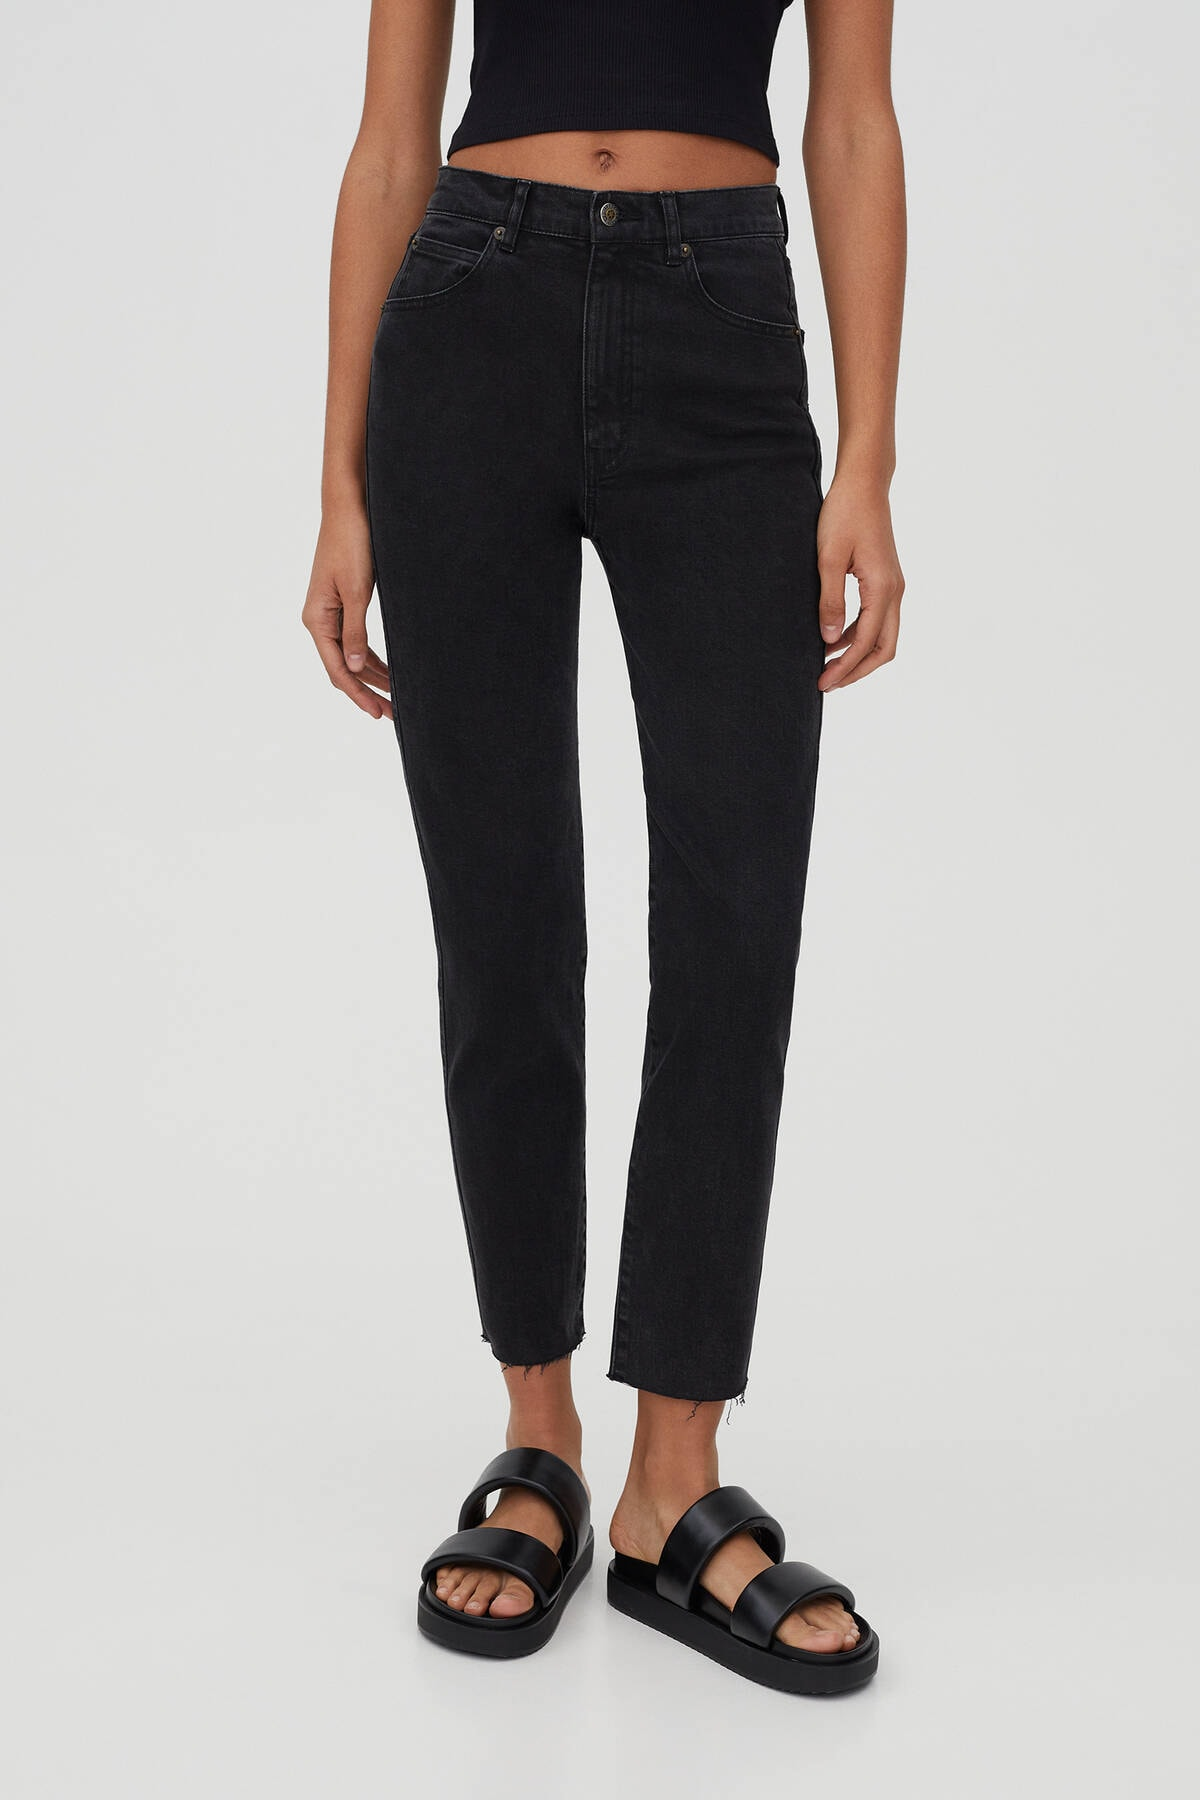 Pull & Bear Kadın Siyah Comfort Slim Fit Mom Jean 4